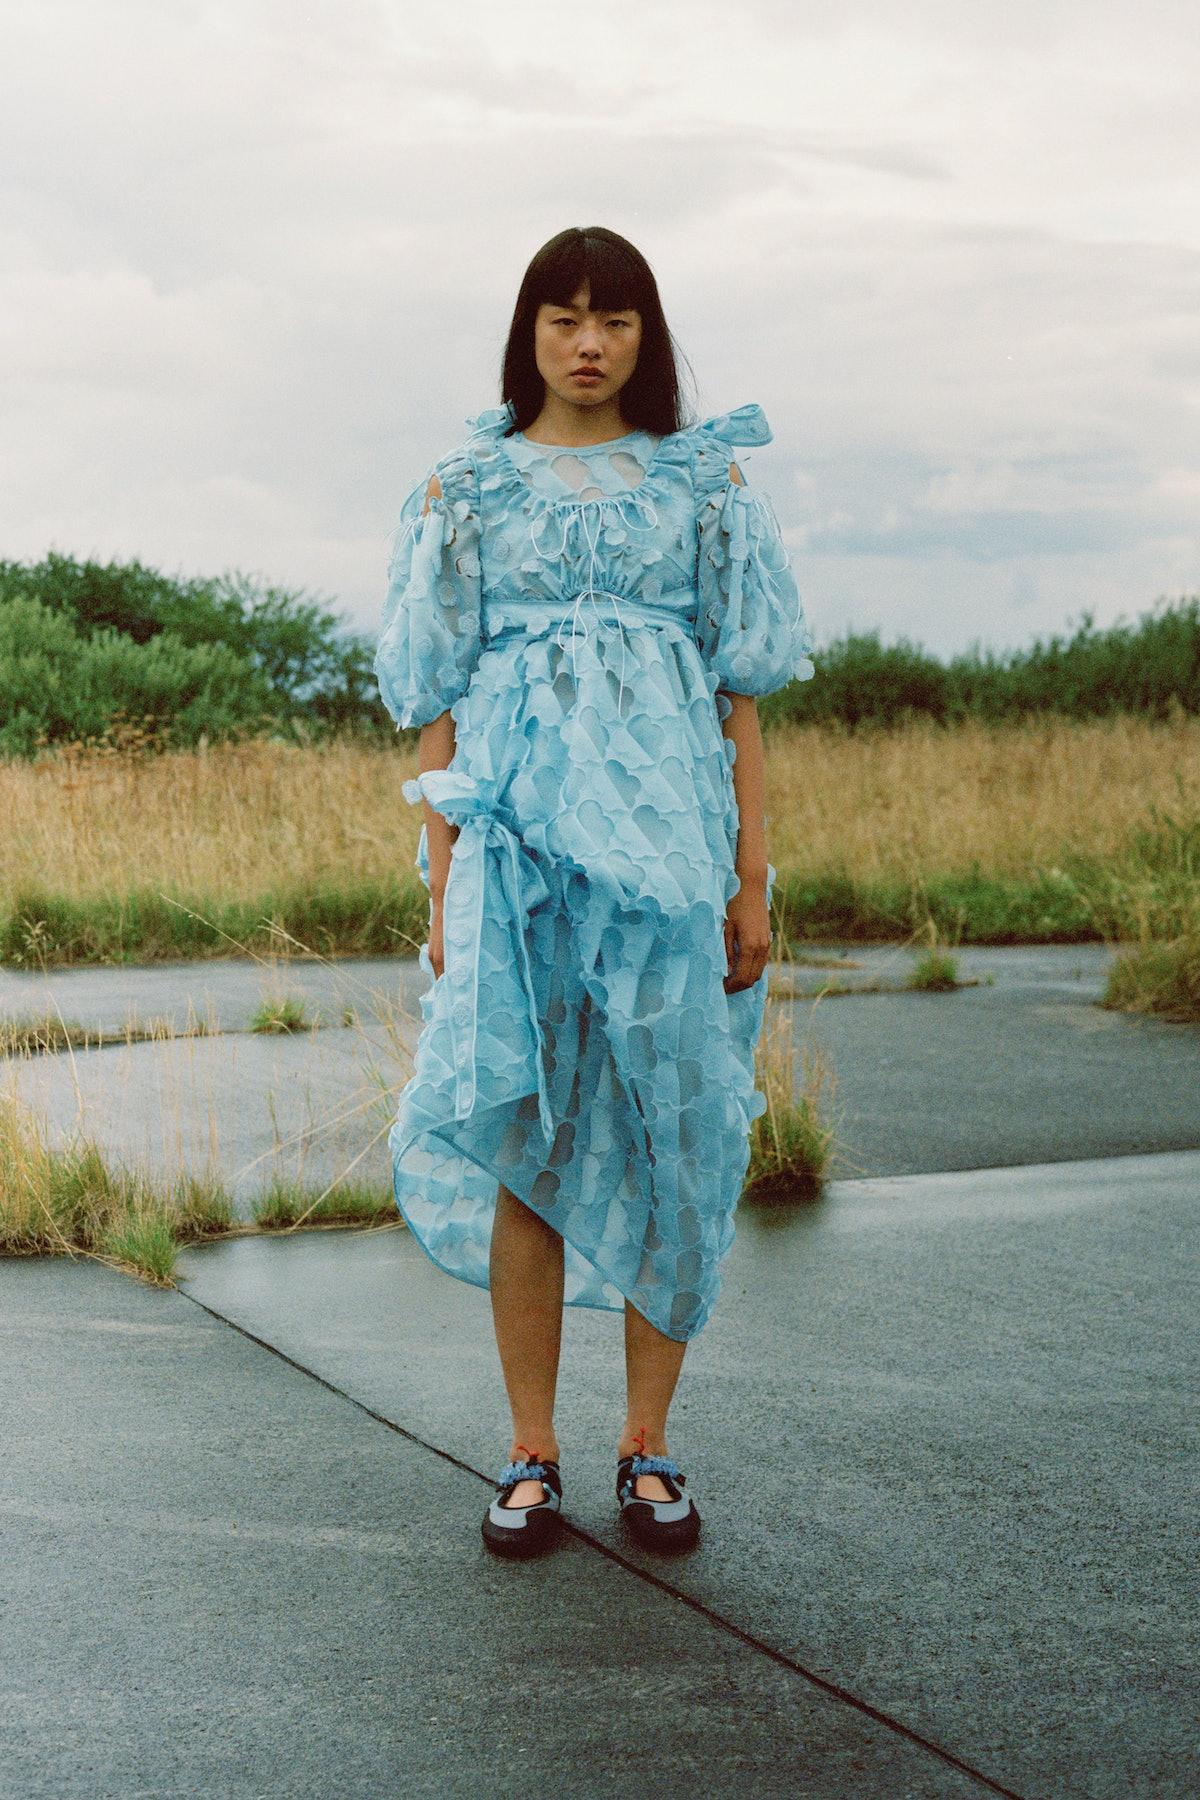 Model in blue cecilie bahnsen dress